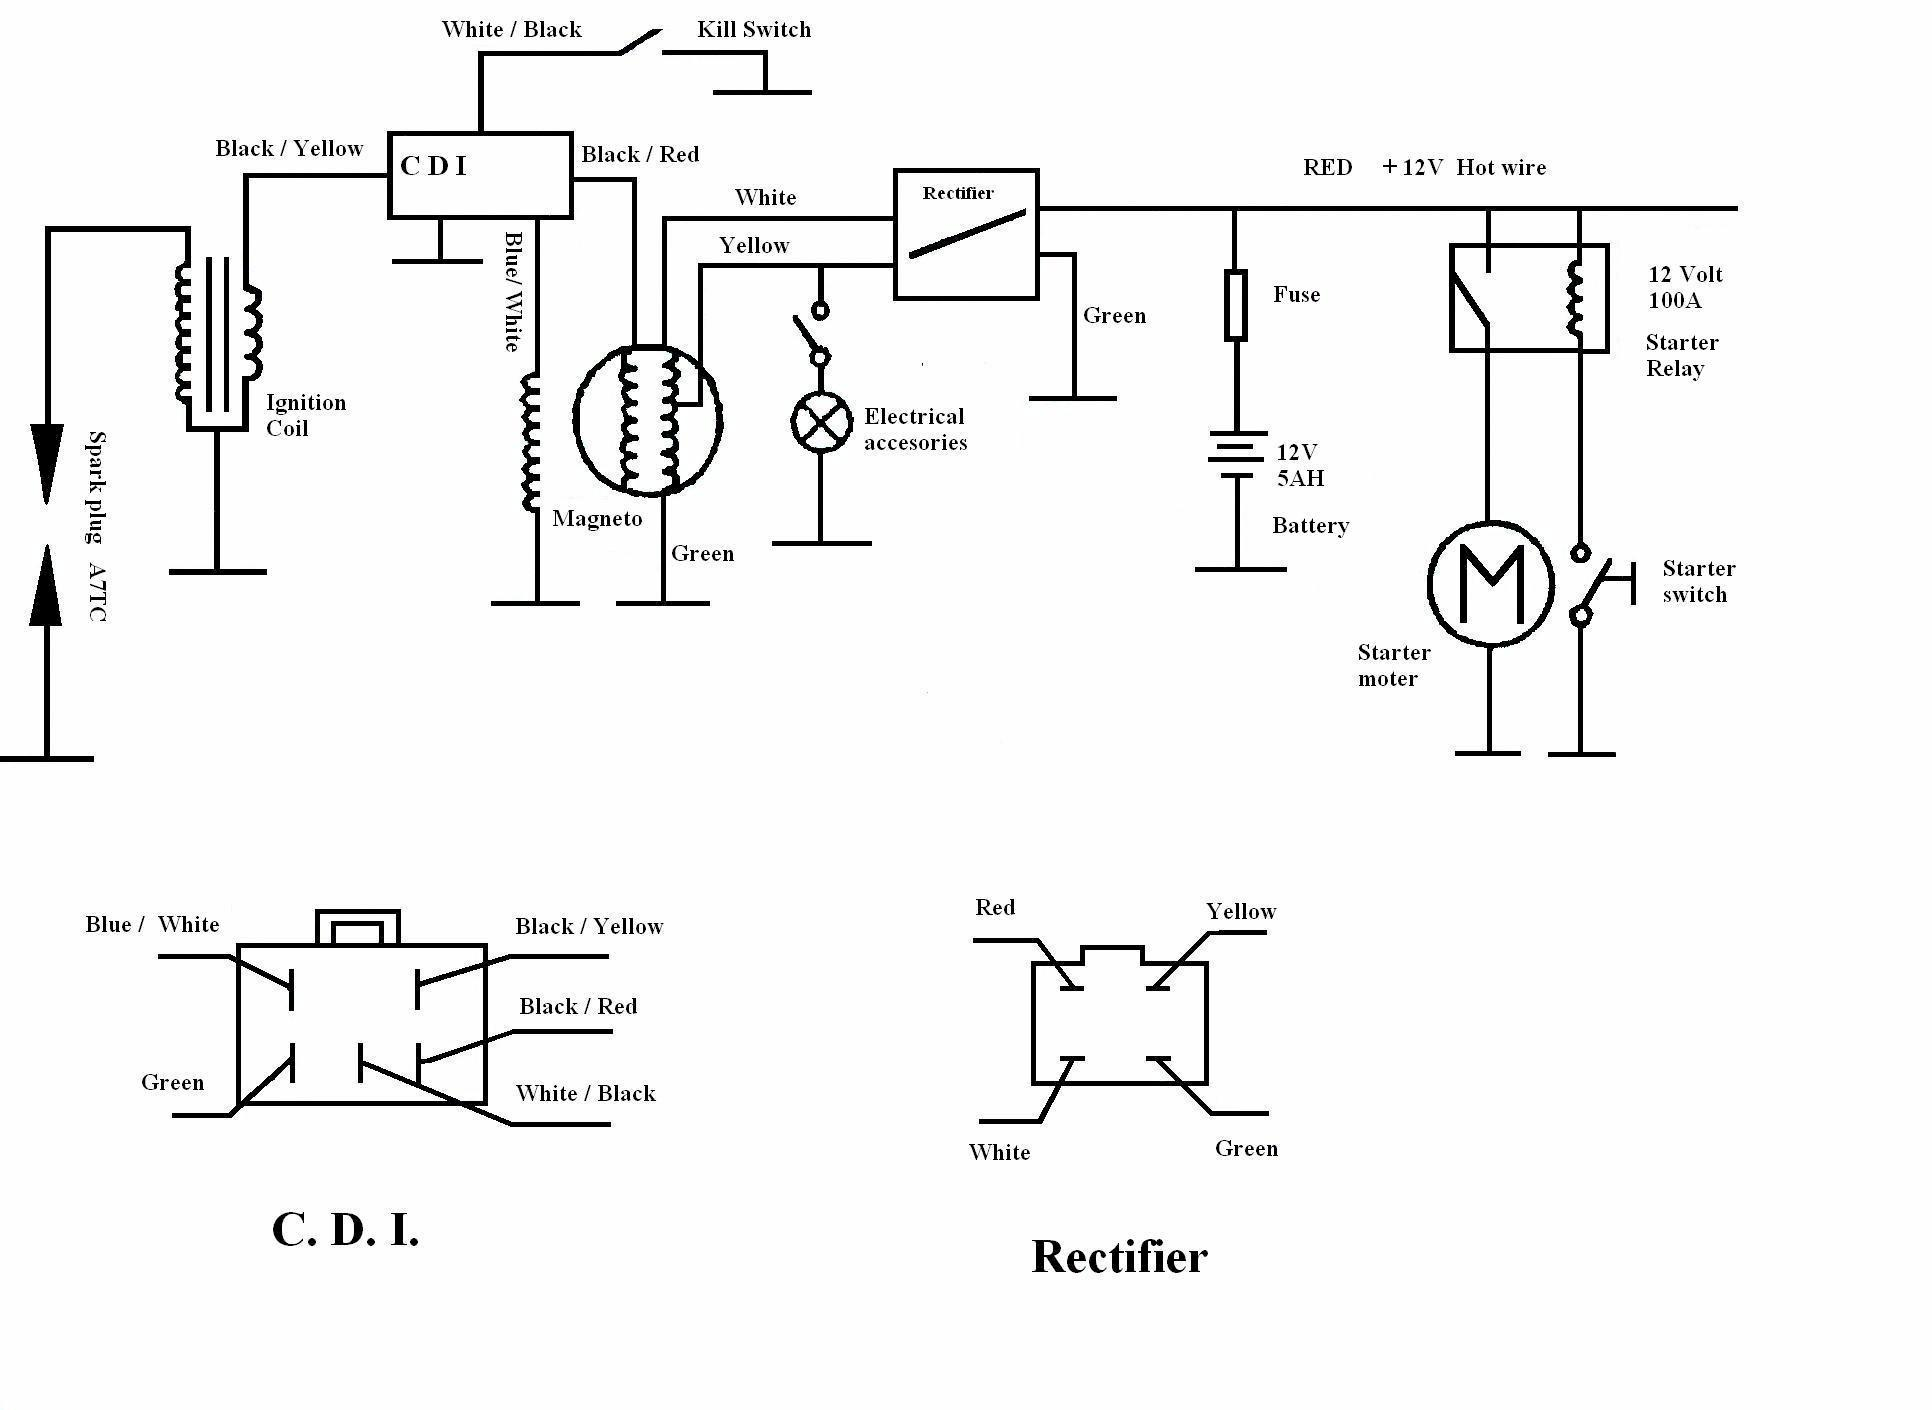 lifan cdi wiring diagram label ear worksheet nl aansluiten algemeen